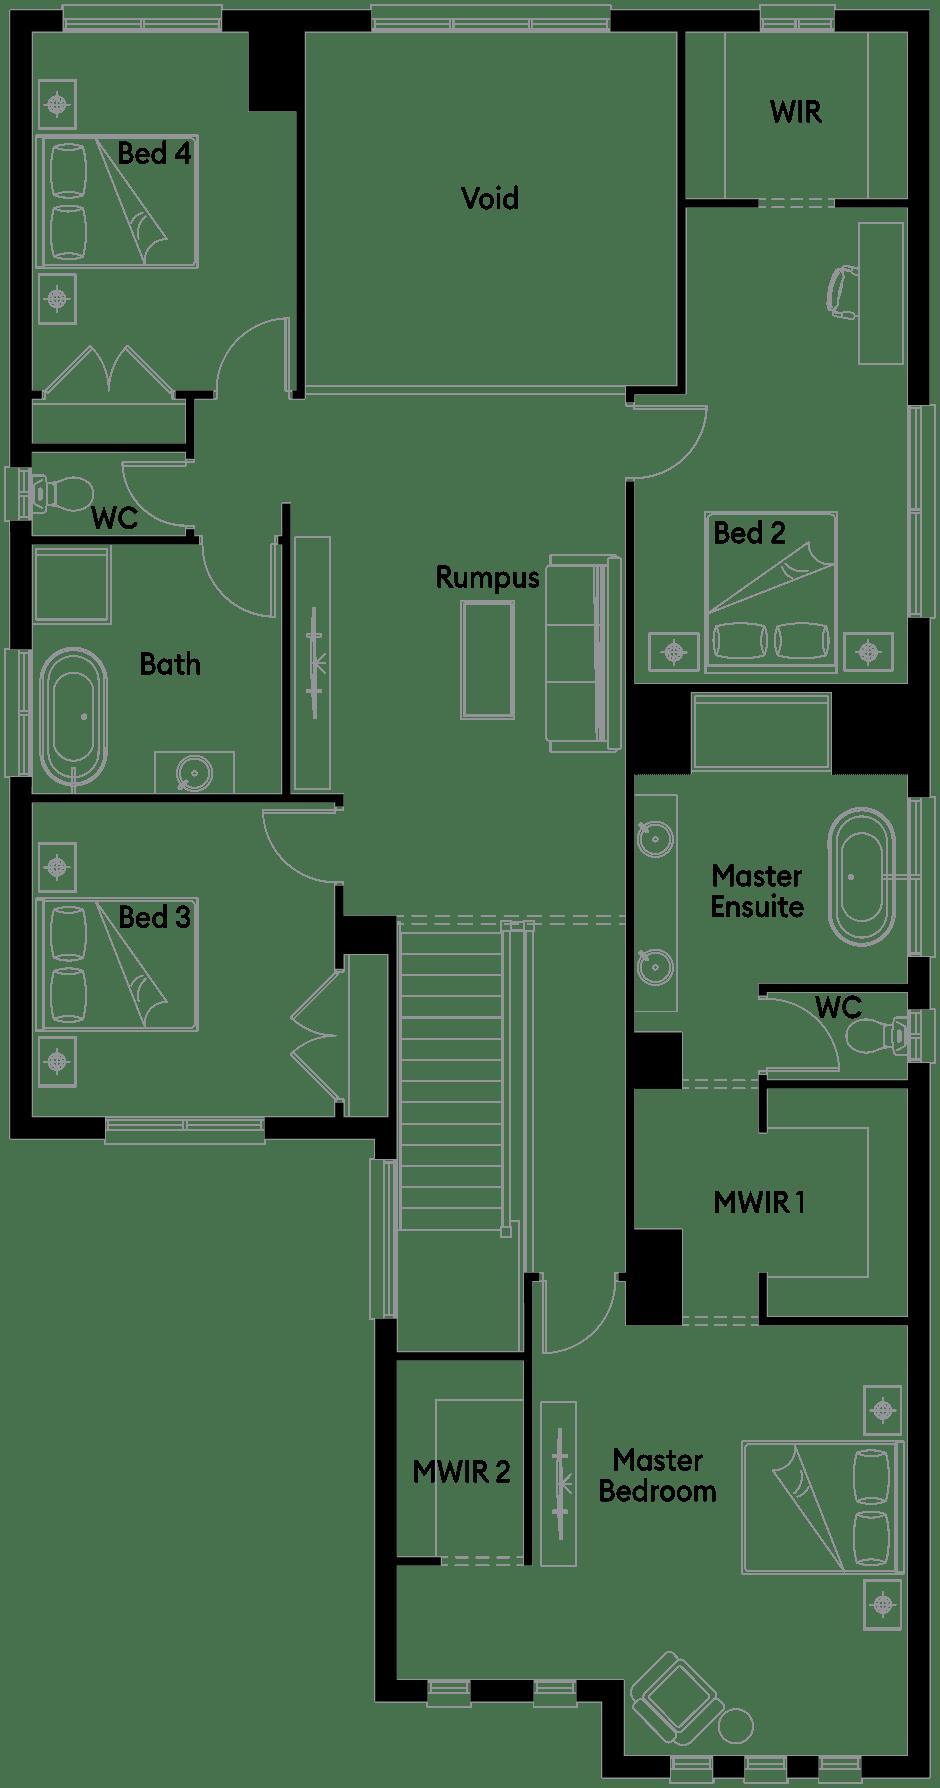 FloorPlan2_HOUSE726_Astor_43L-02